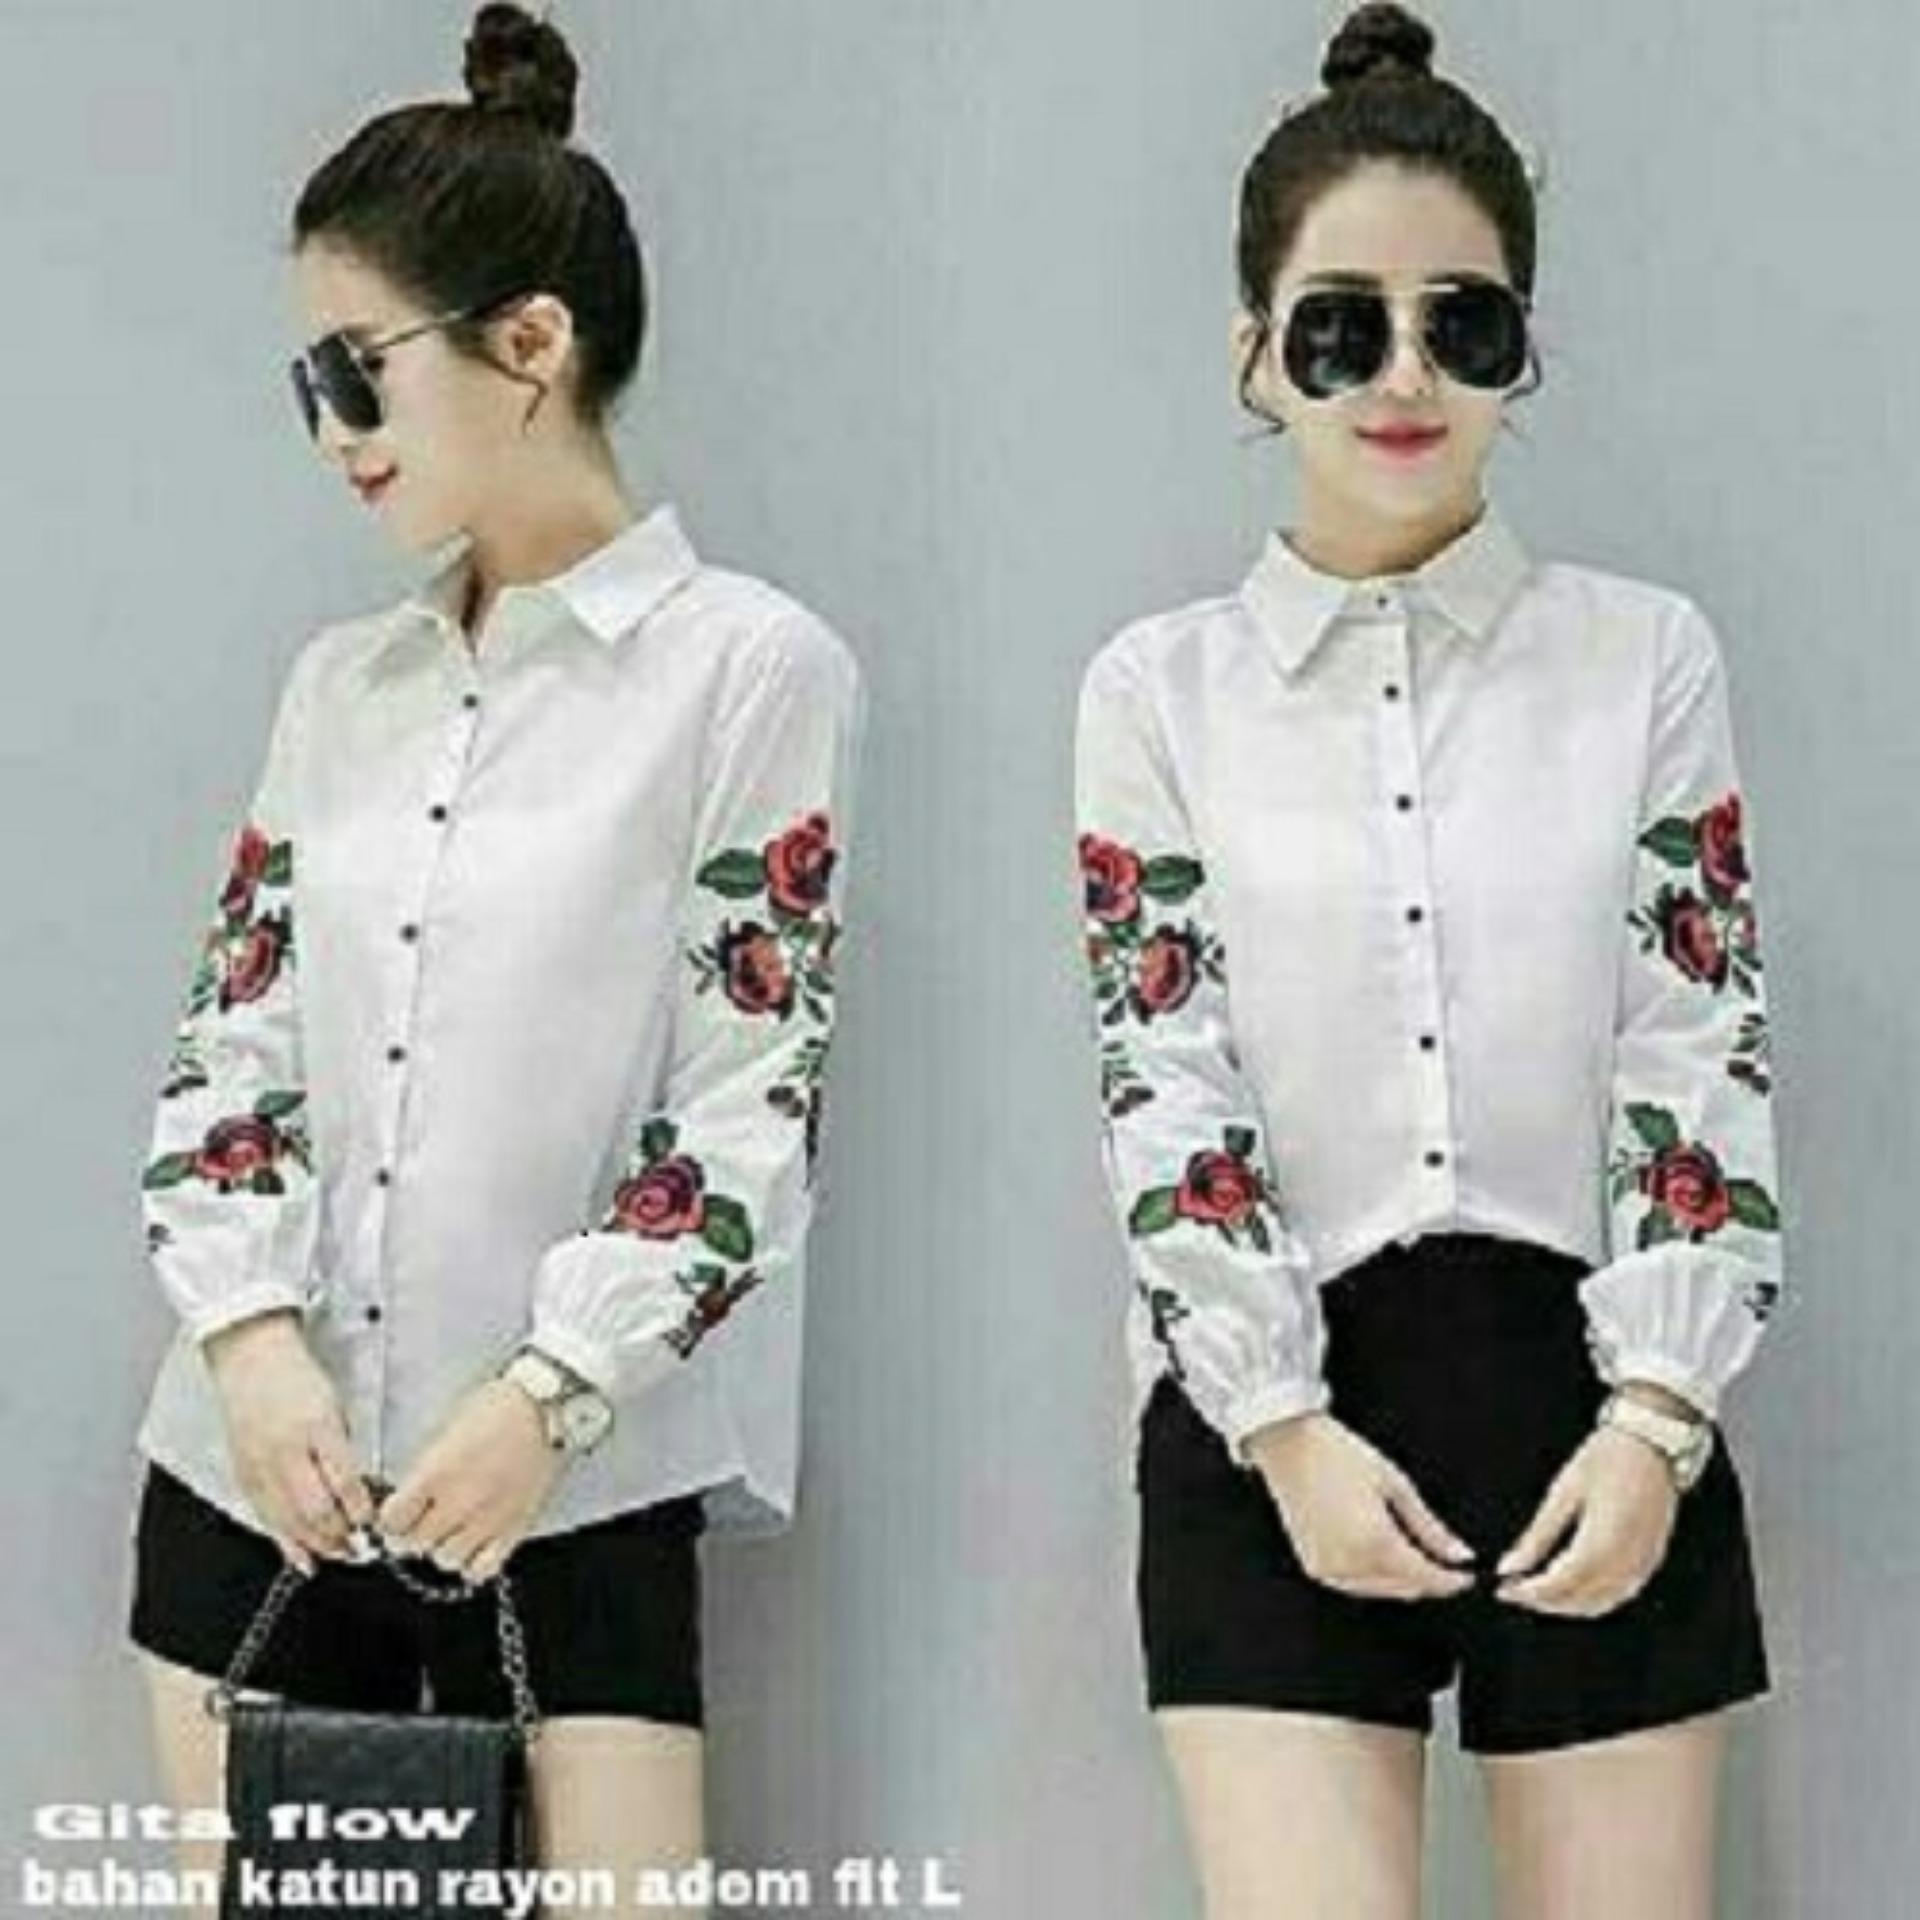 F Fashion Kemeja Wanita Gita Navy Daftar Harga Terkini Dan Jaket Korea Fit Xl Amorshop Flow Atasan 080